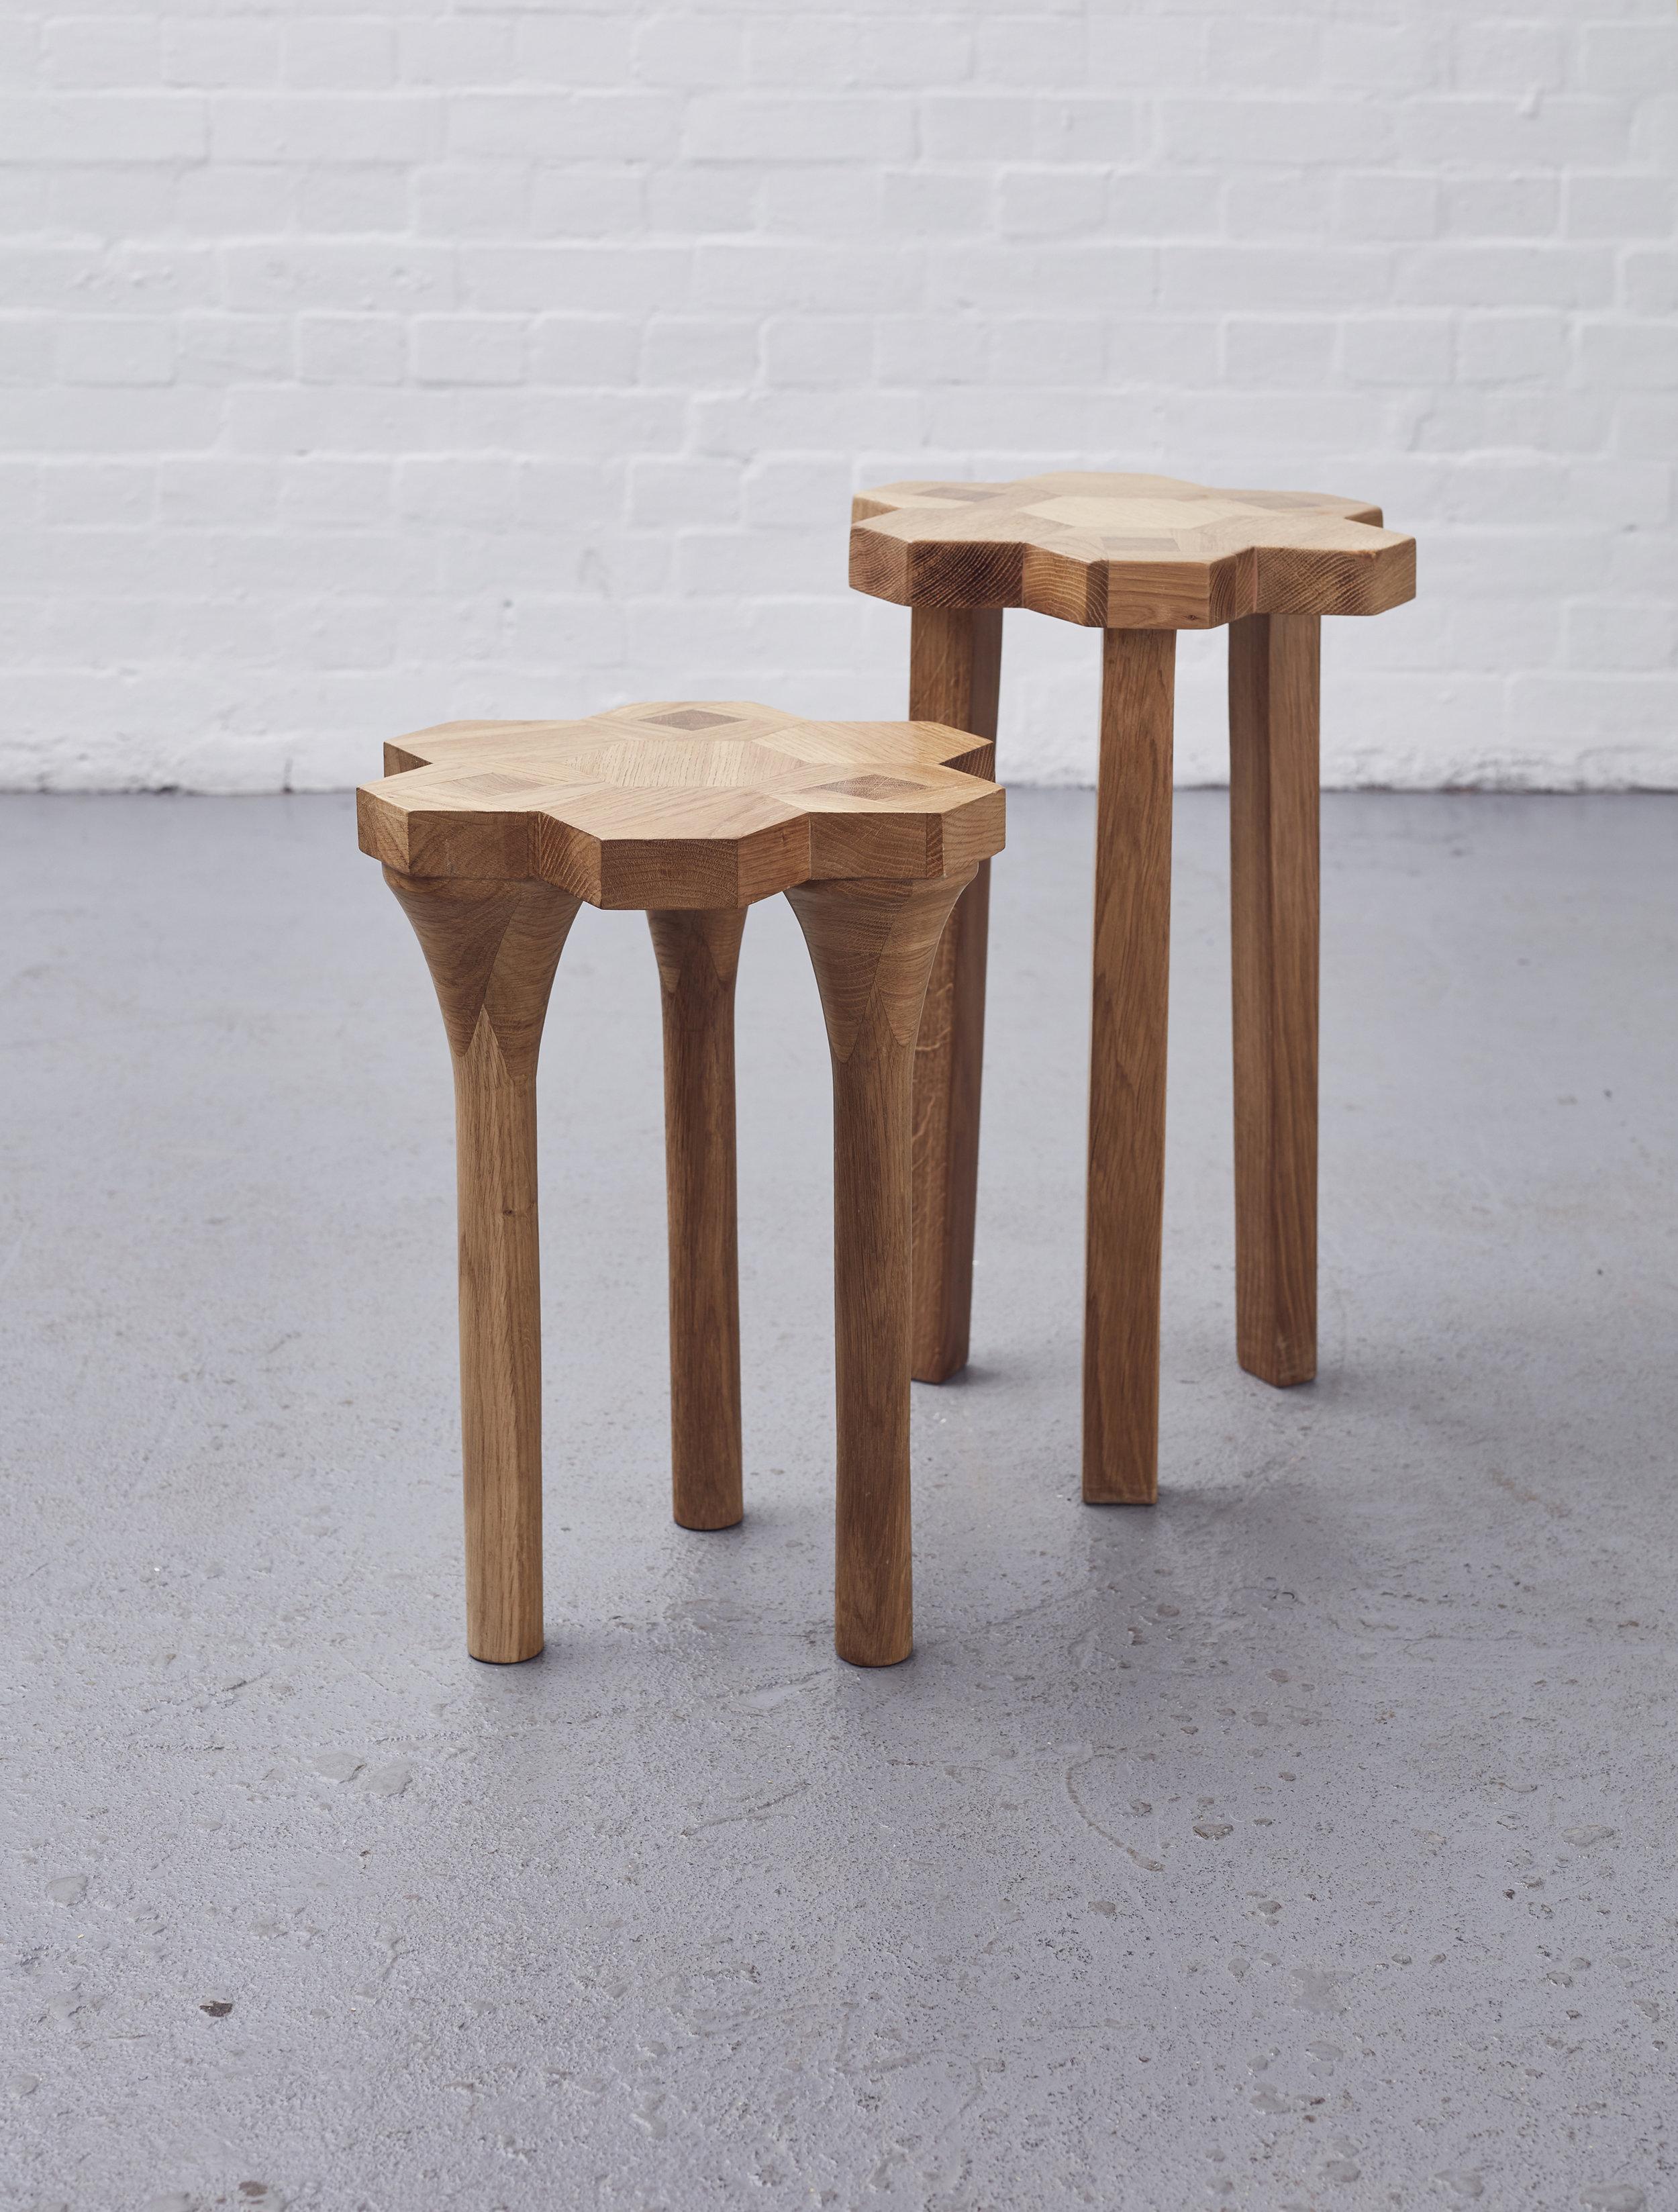 Luster stools